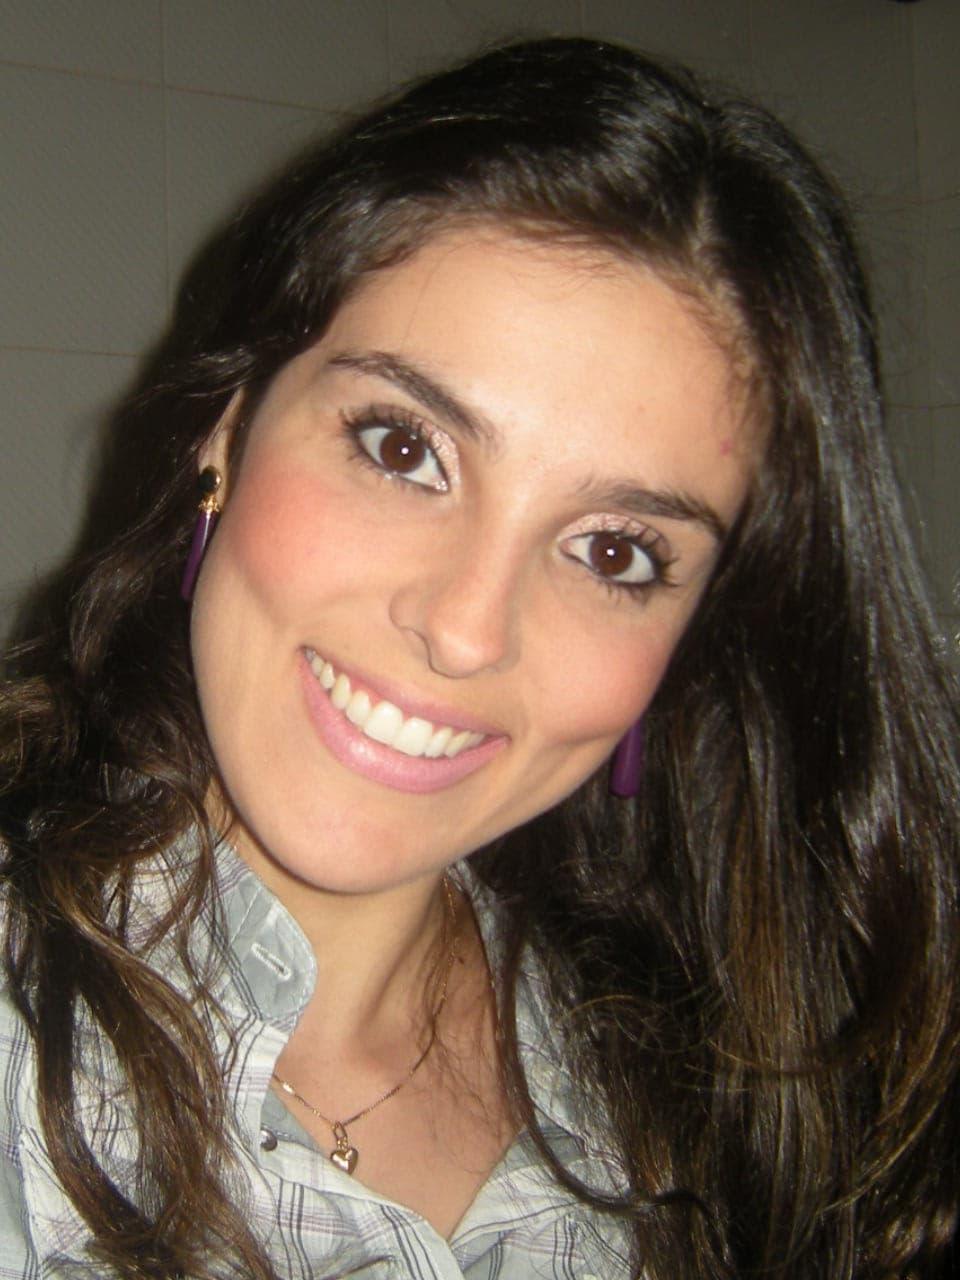 Marinelle